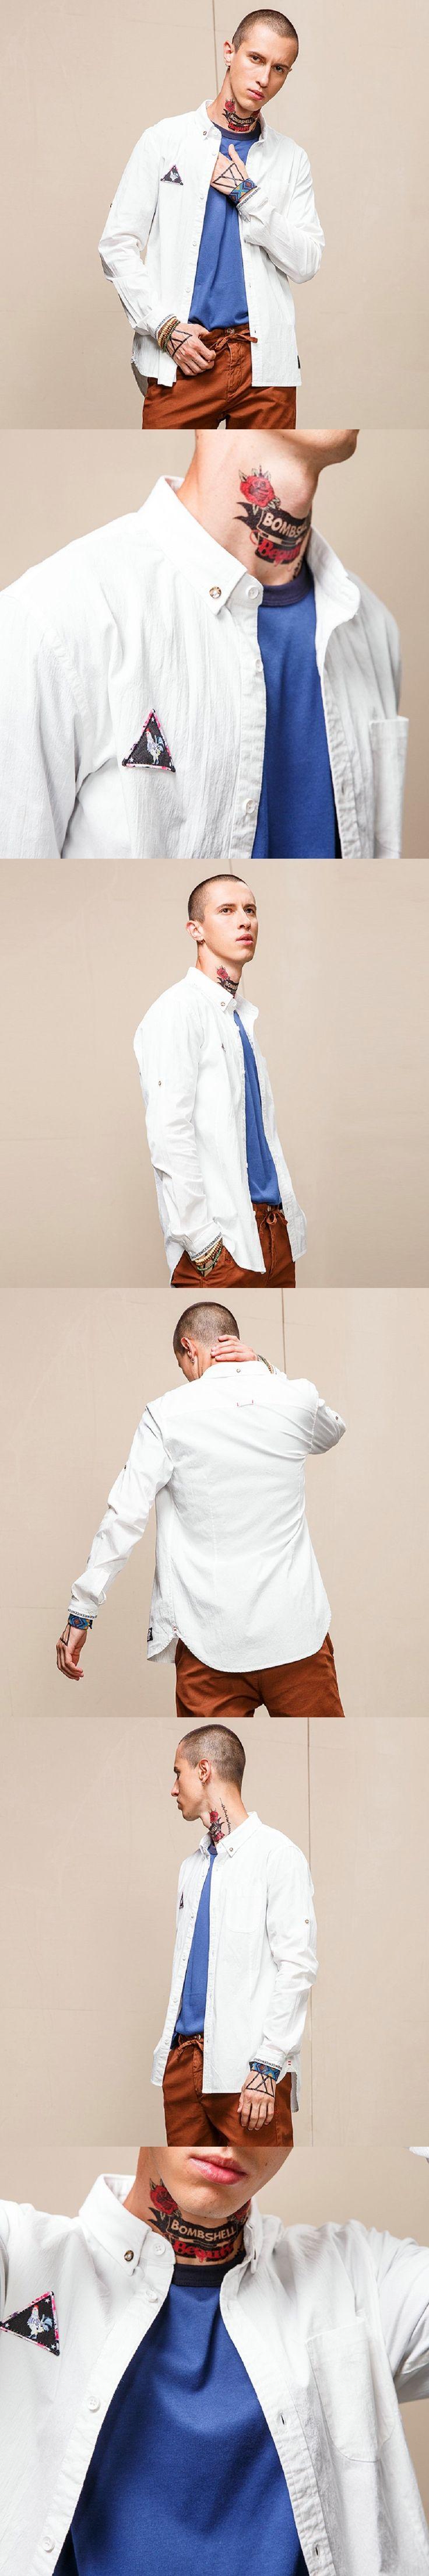 Fashion New 2017 Men Shirts Male Striped Formal Dress Shirt Long Sleeve Mens Brand Casual medusa Shirts